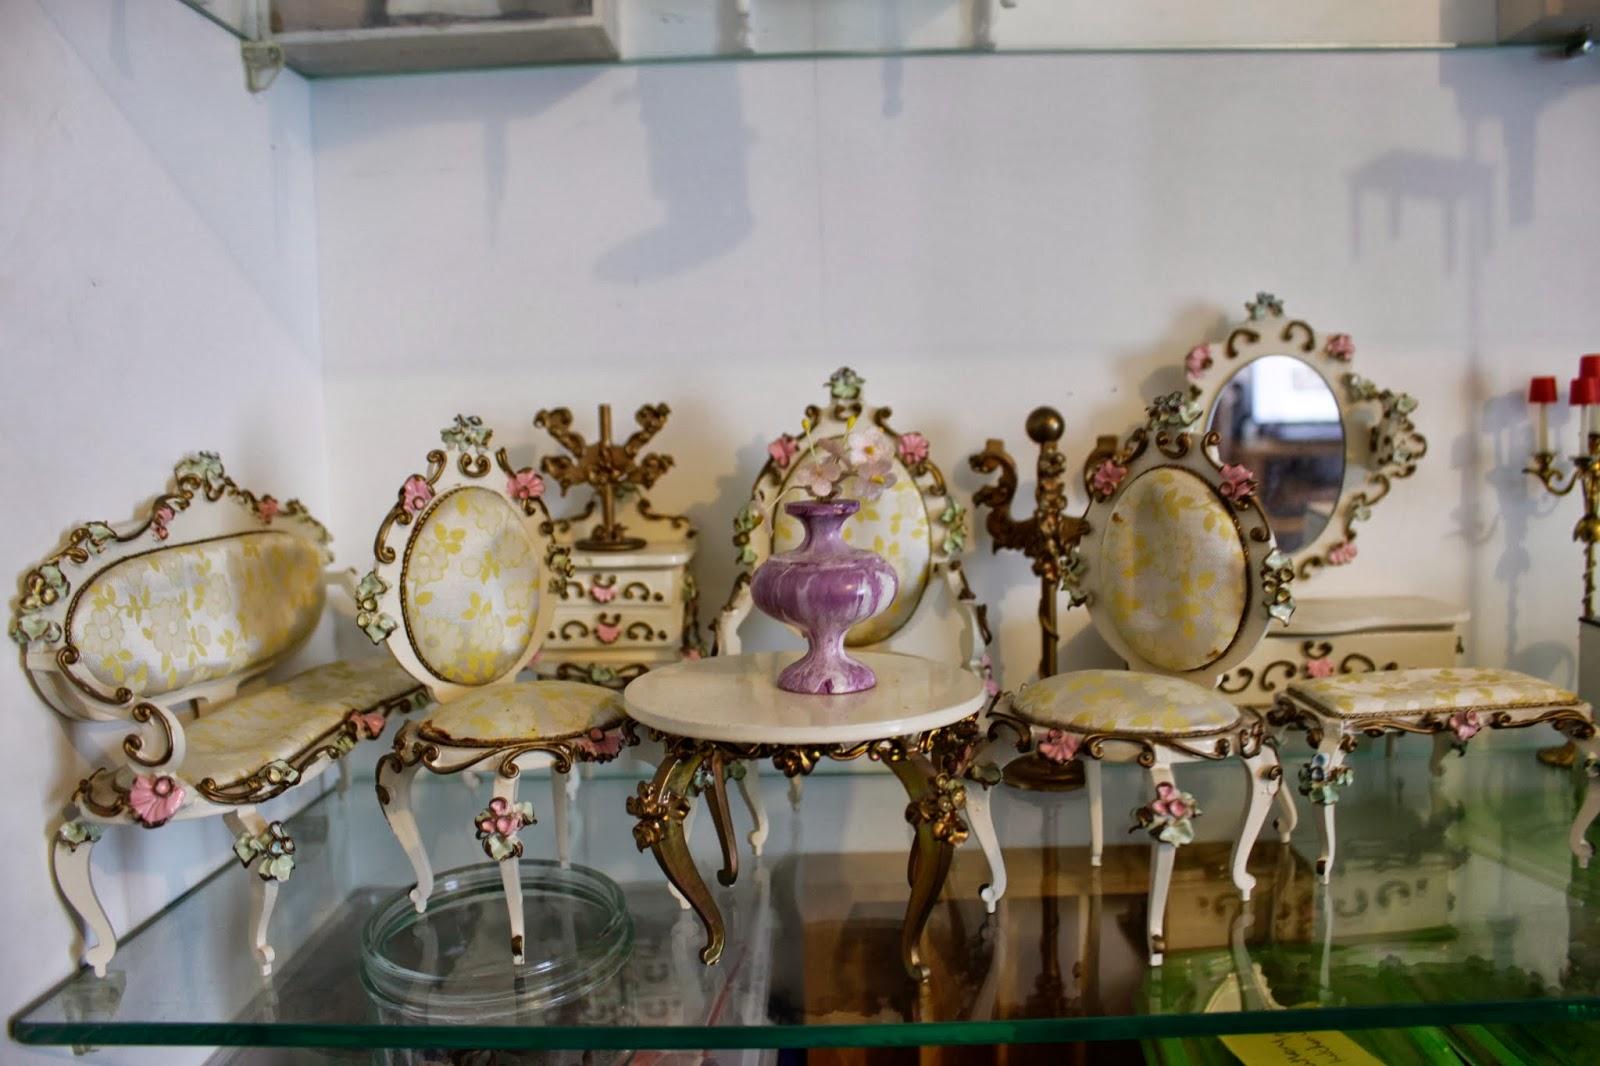 Szalasi / Spielwaren Furniture And Selina Rose Gallery